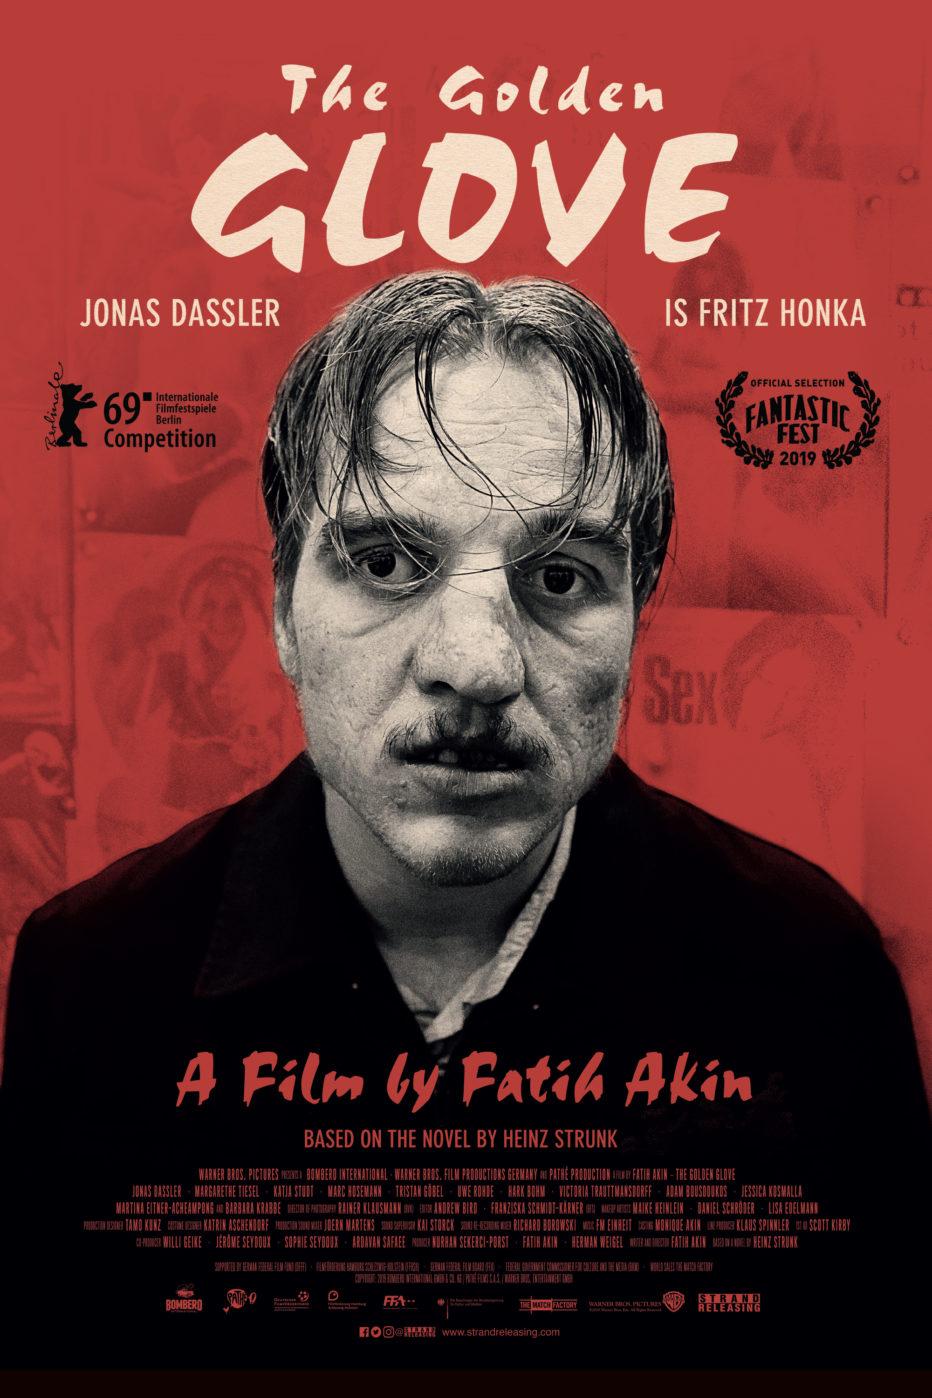 El monstruo de St. Pauli: muerte y asco en Hamburgo